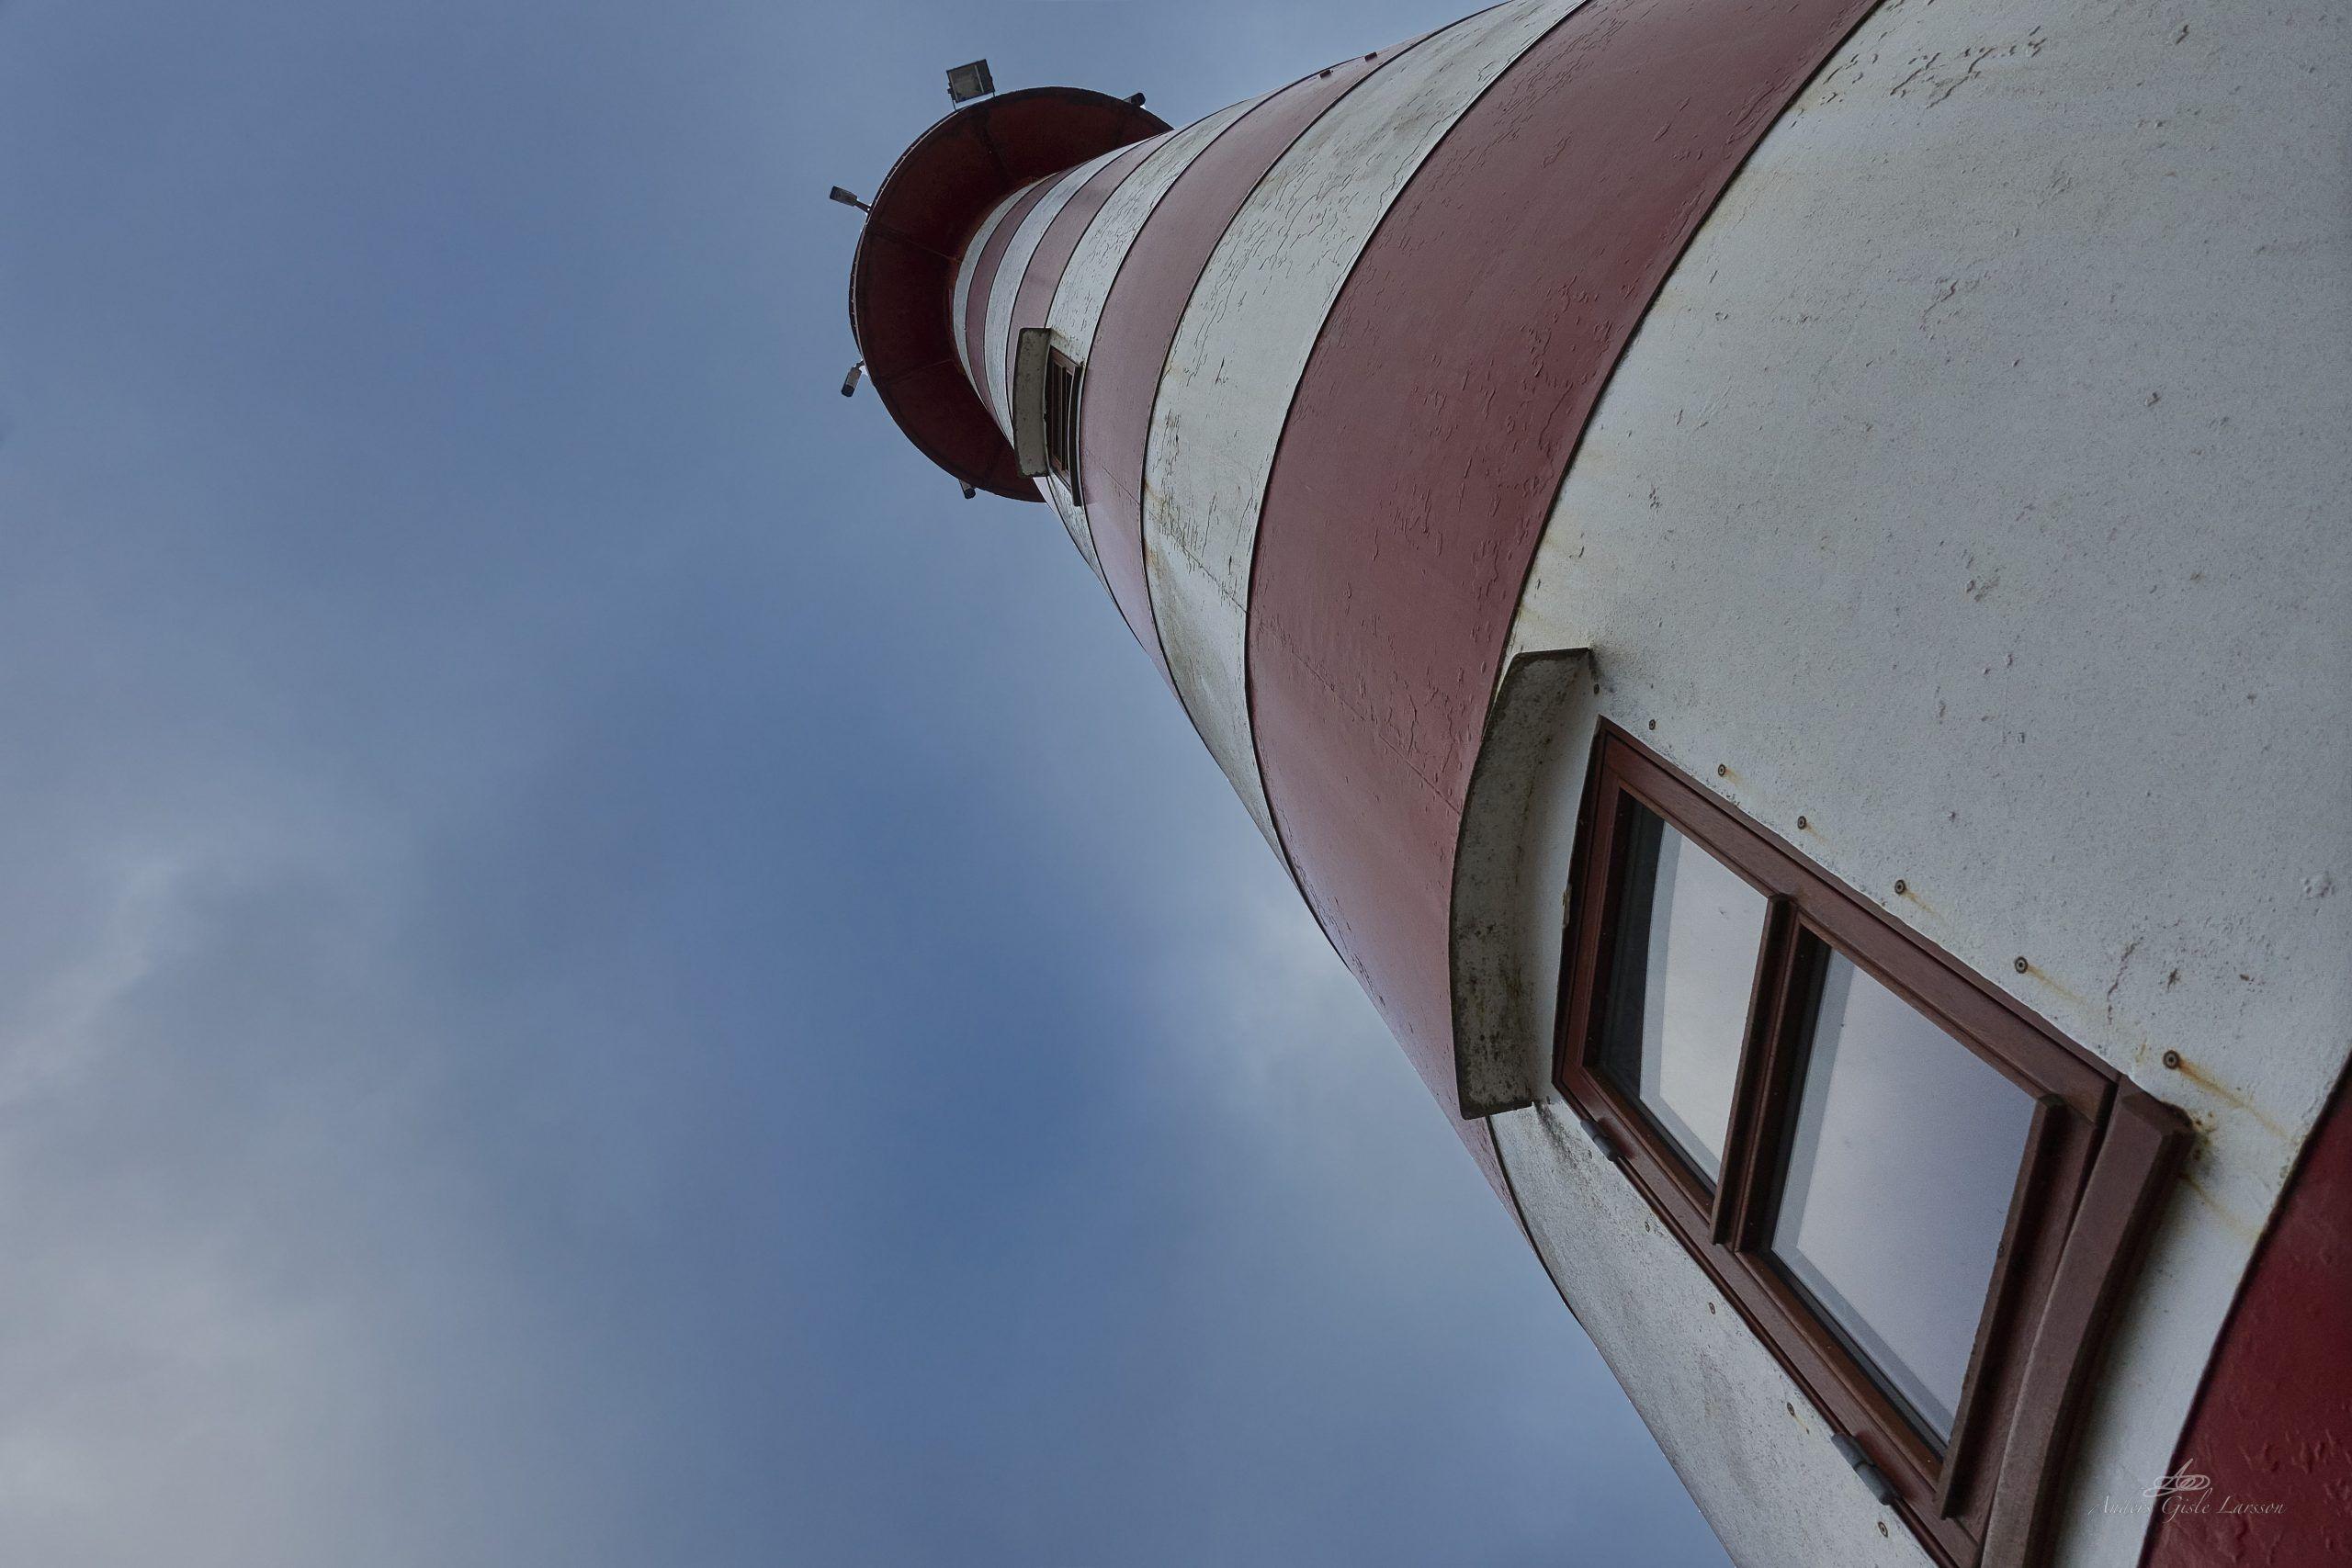 Fyrtårnet, Uge 24, Kongsdal Lystbådehavn, Mariager - Hadsund